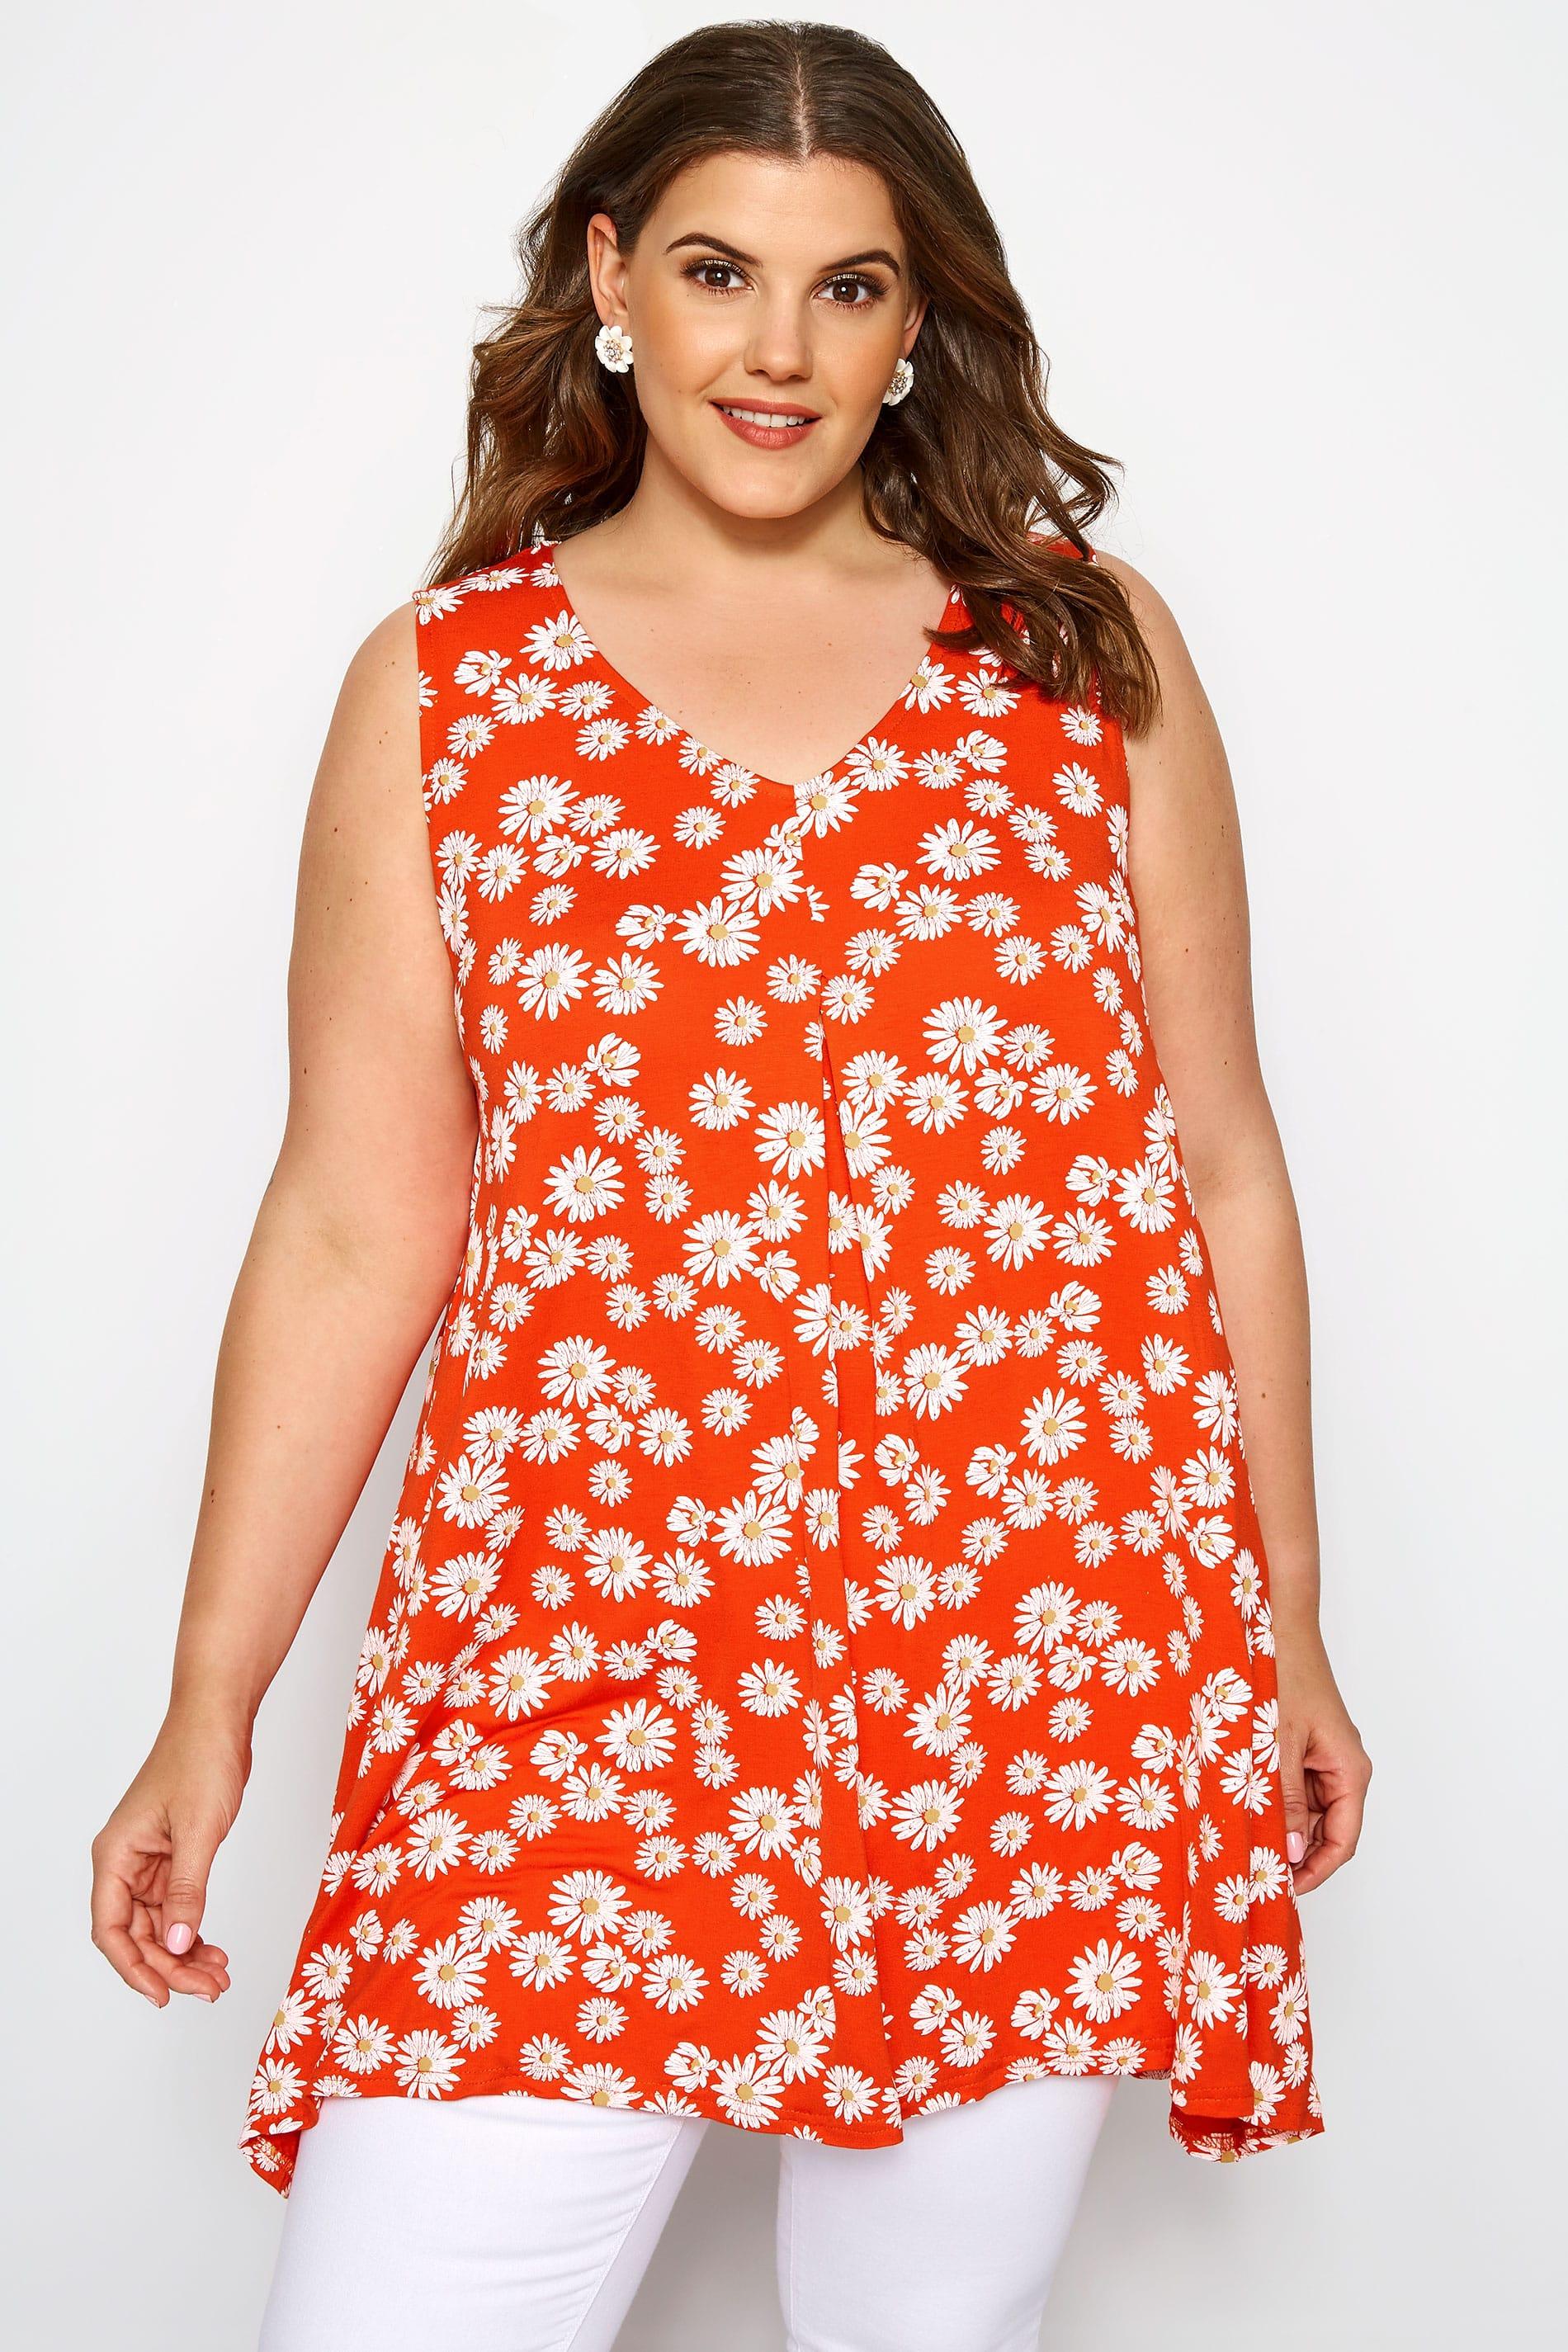 Dark Orange Floral Daisy Swing Vest Top